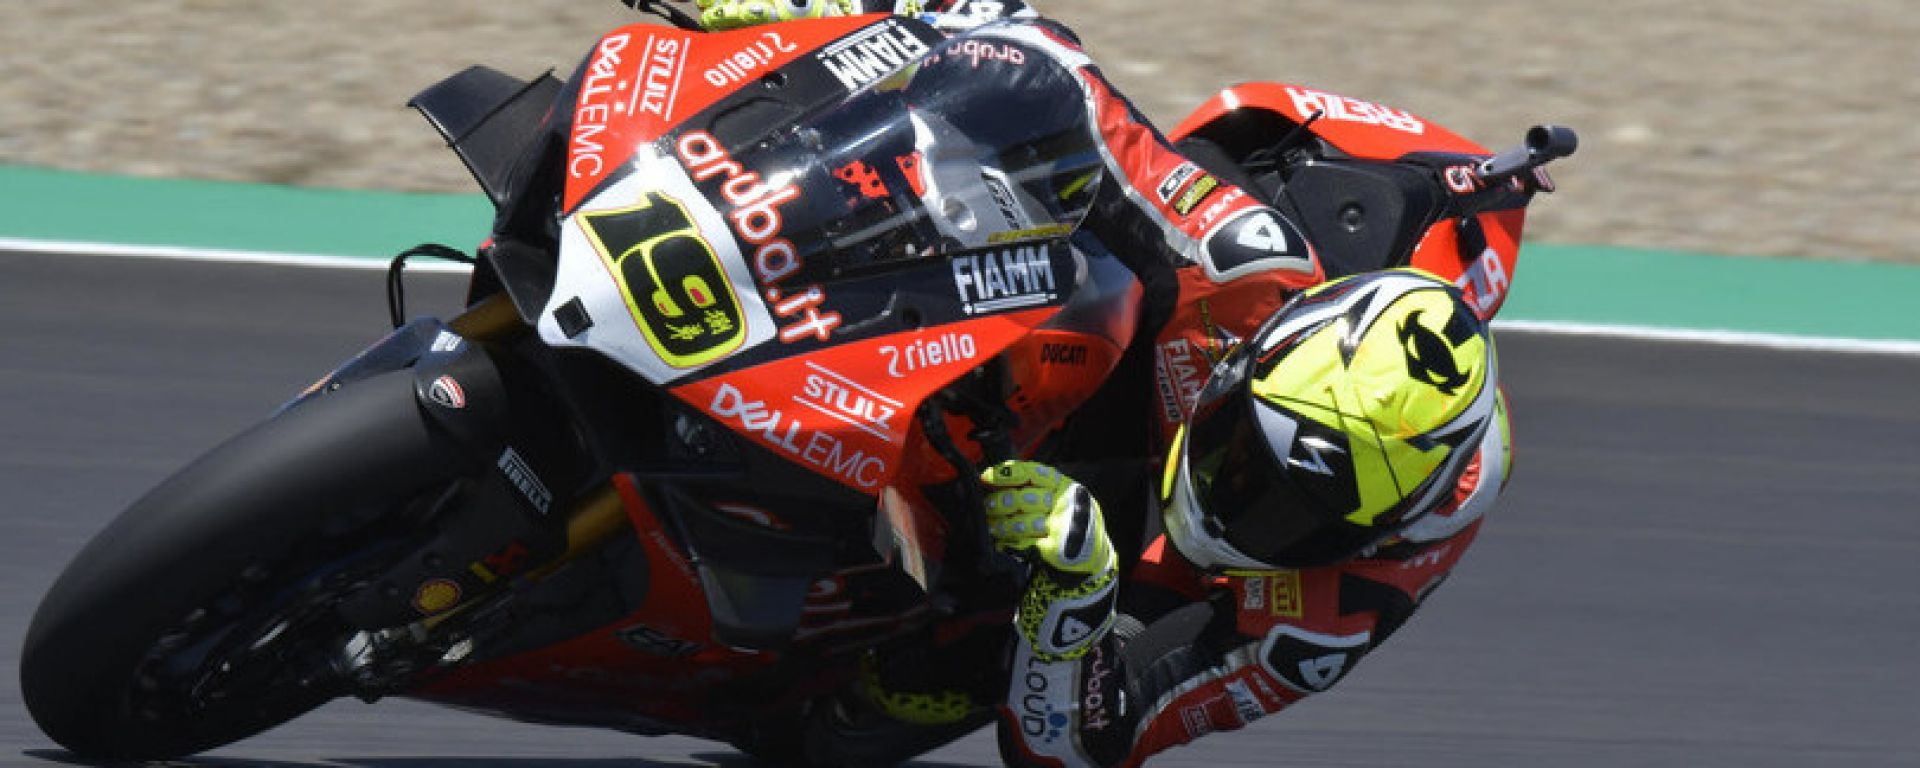 Spanish Round Superbike, Jerez, Alvaro Bautista (Ducati)